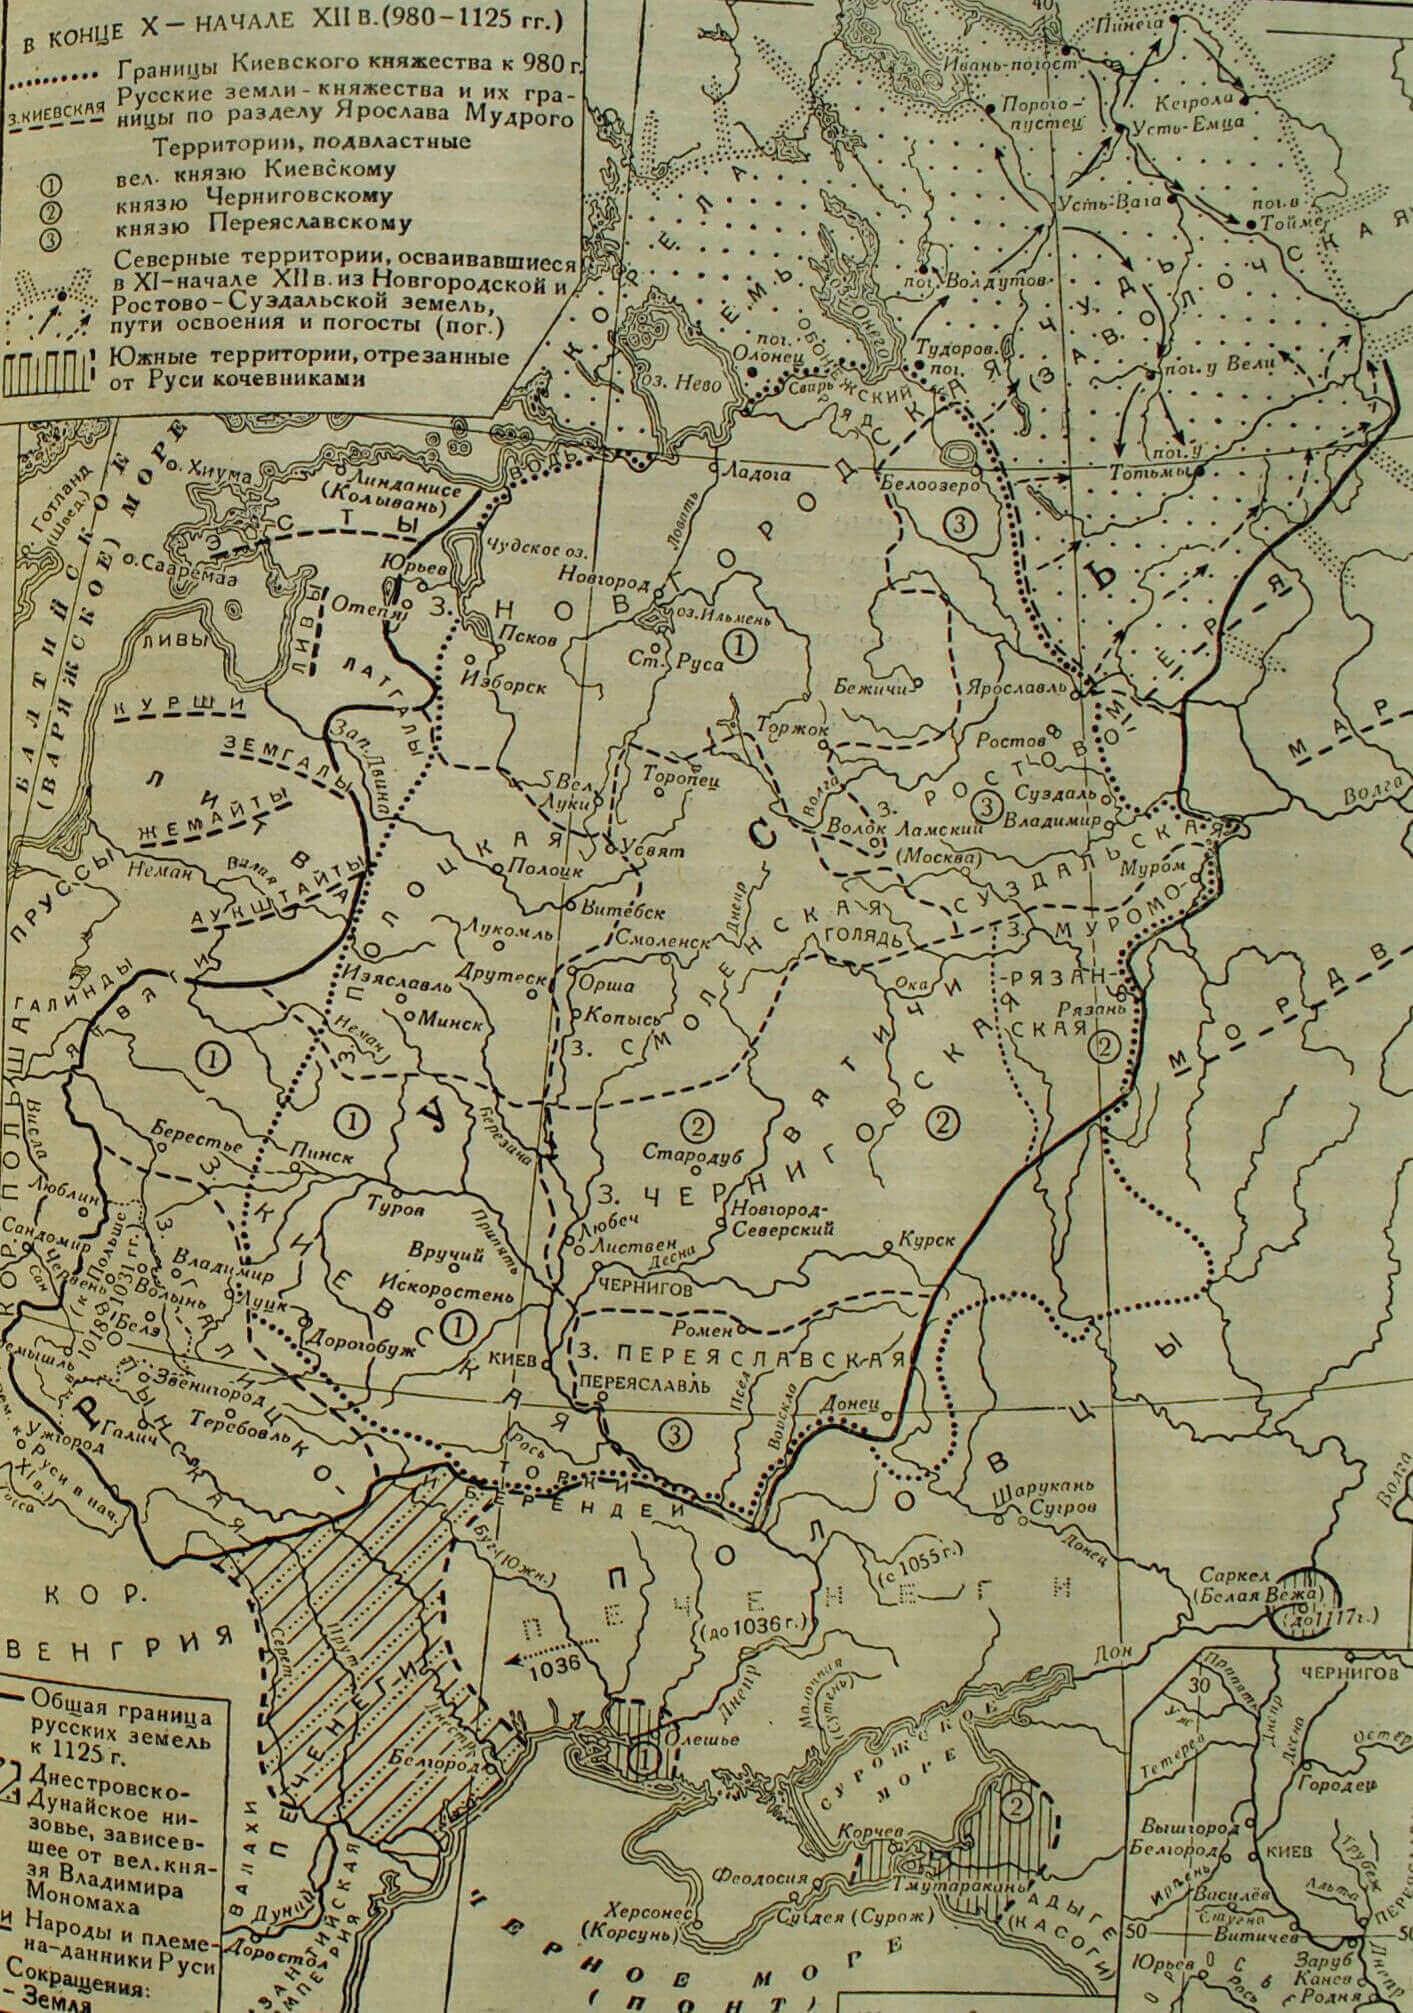 Русь в конце X начале XII в (980 - 1125 гг.)